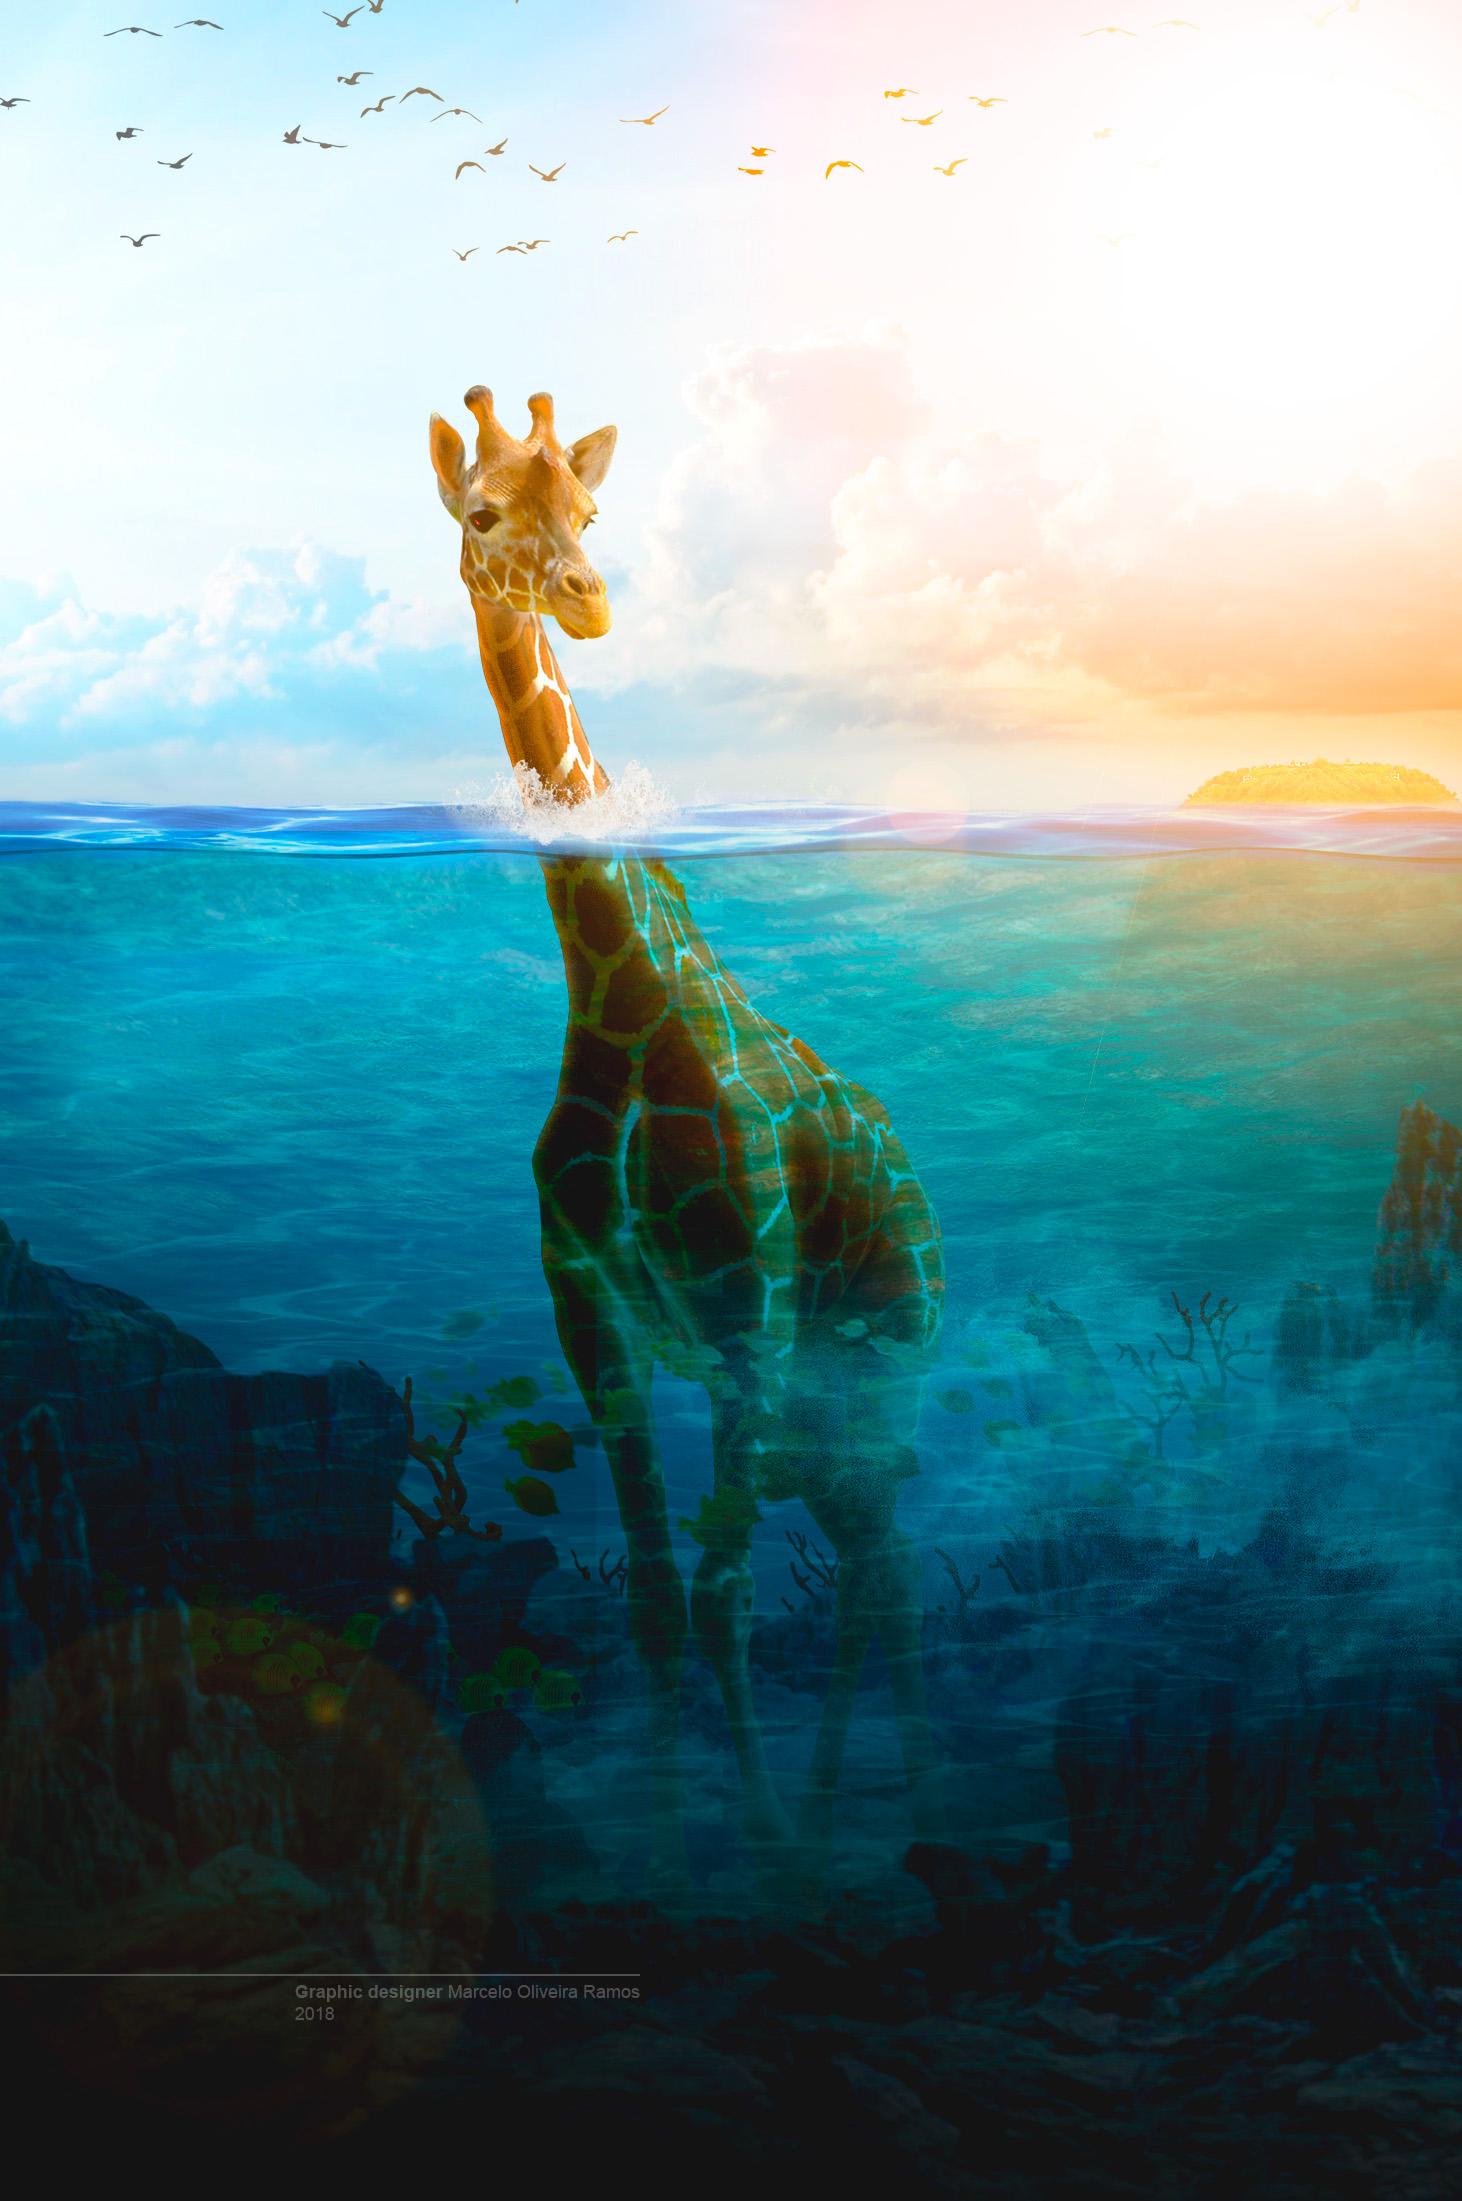 жираф в воде картинки прикол извлечем любого цифрового